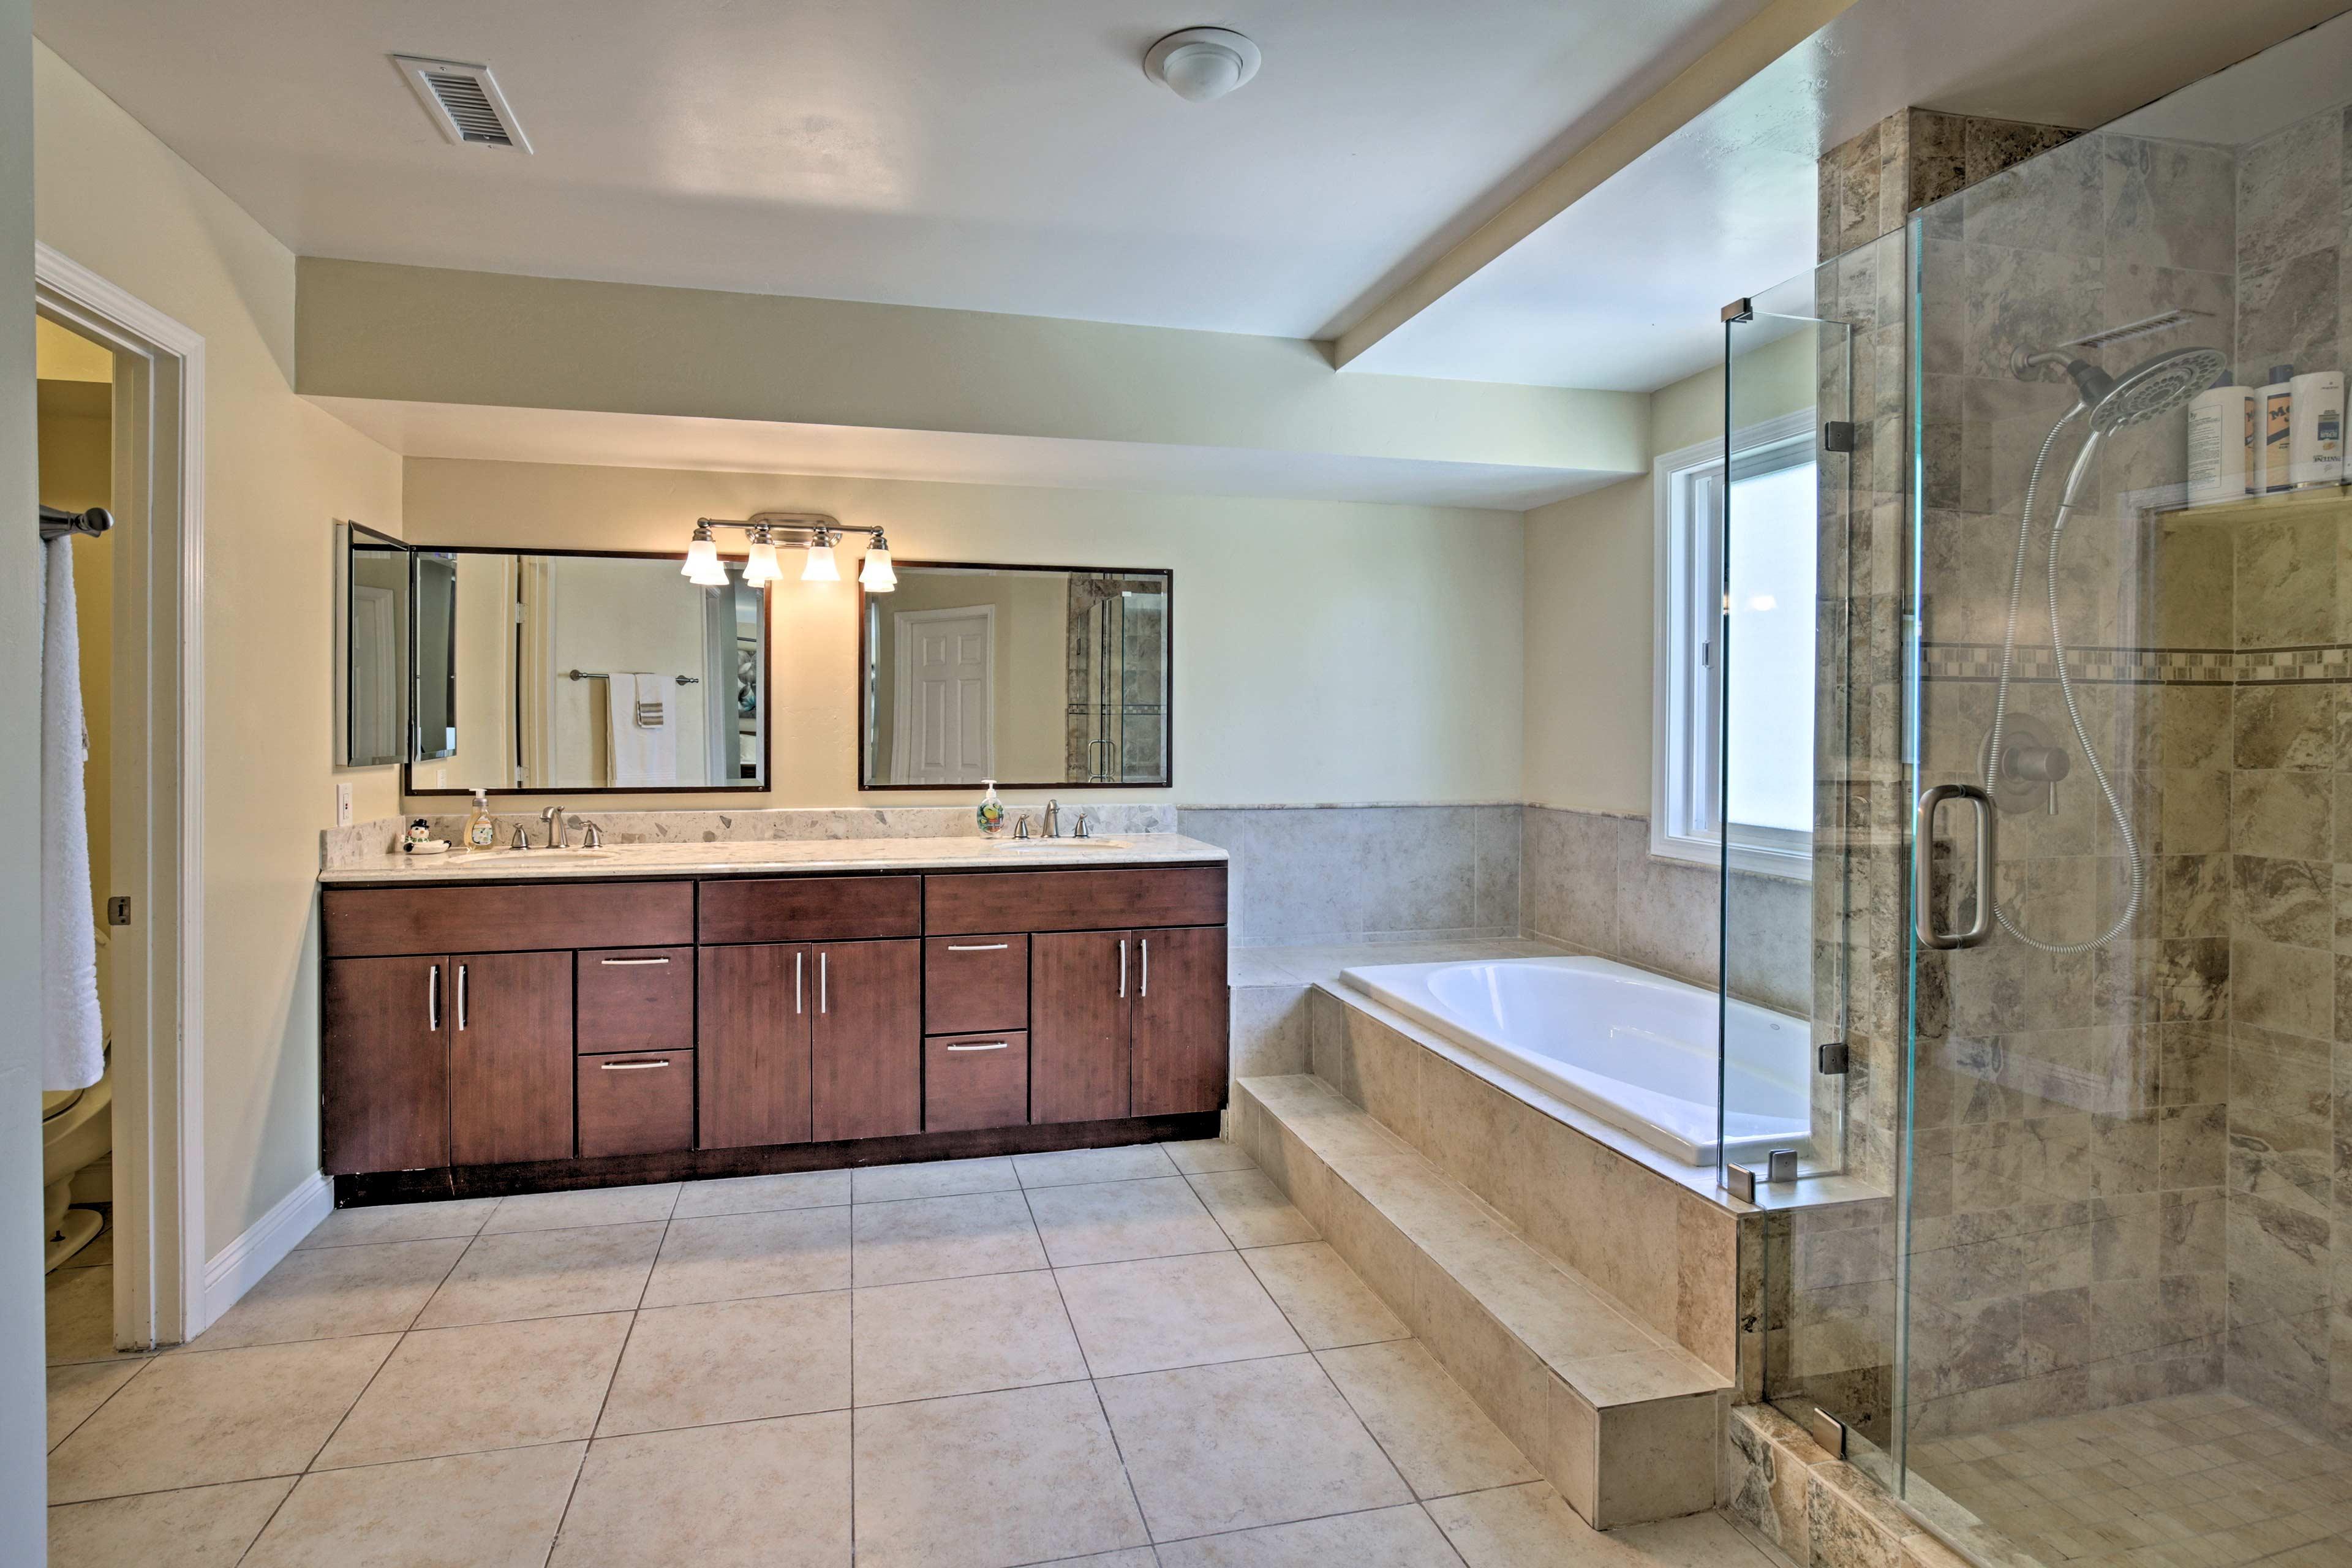 Freshen up in the lavish en-suite bath, with a garden tub & walk-in shower.